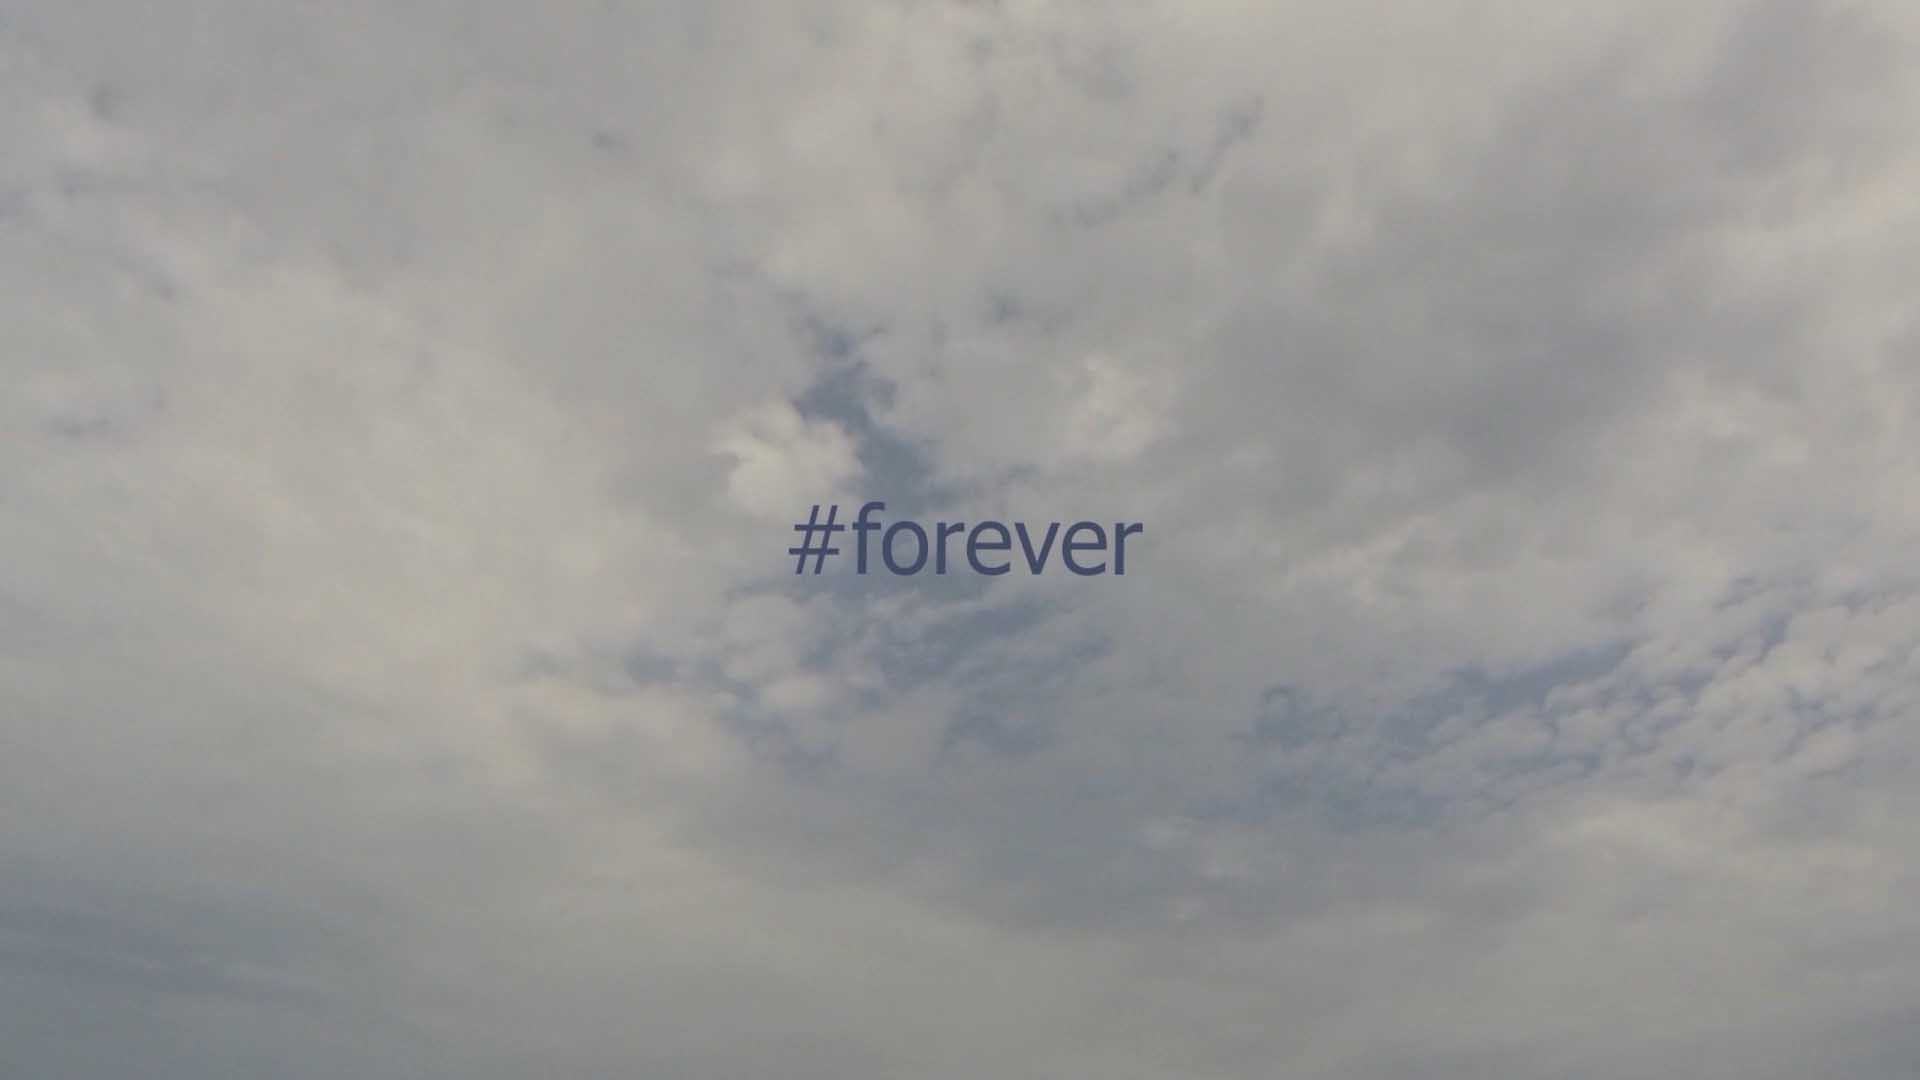 Becquemin & Sagot_#forever.jpg